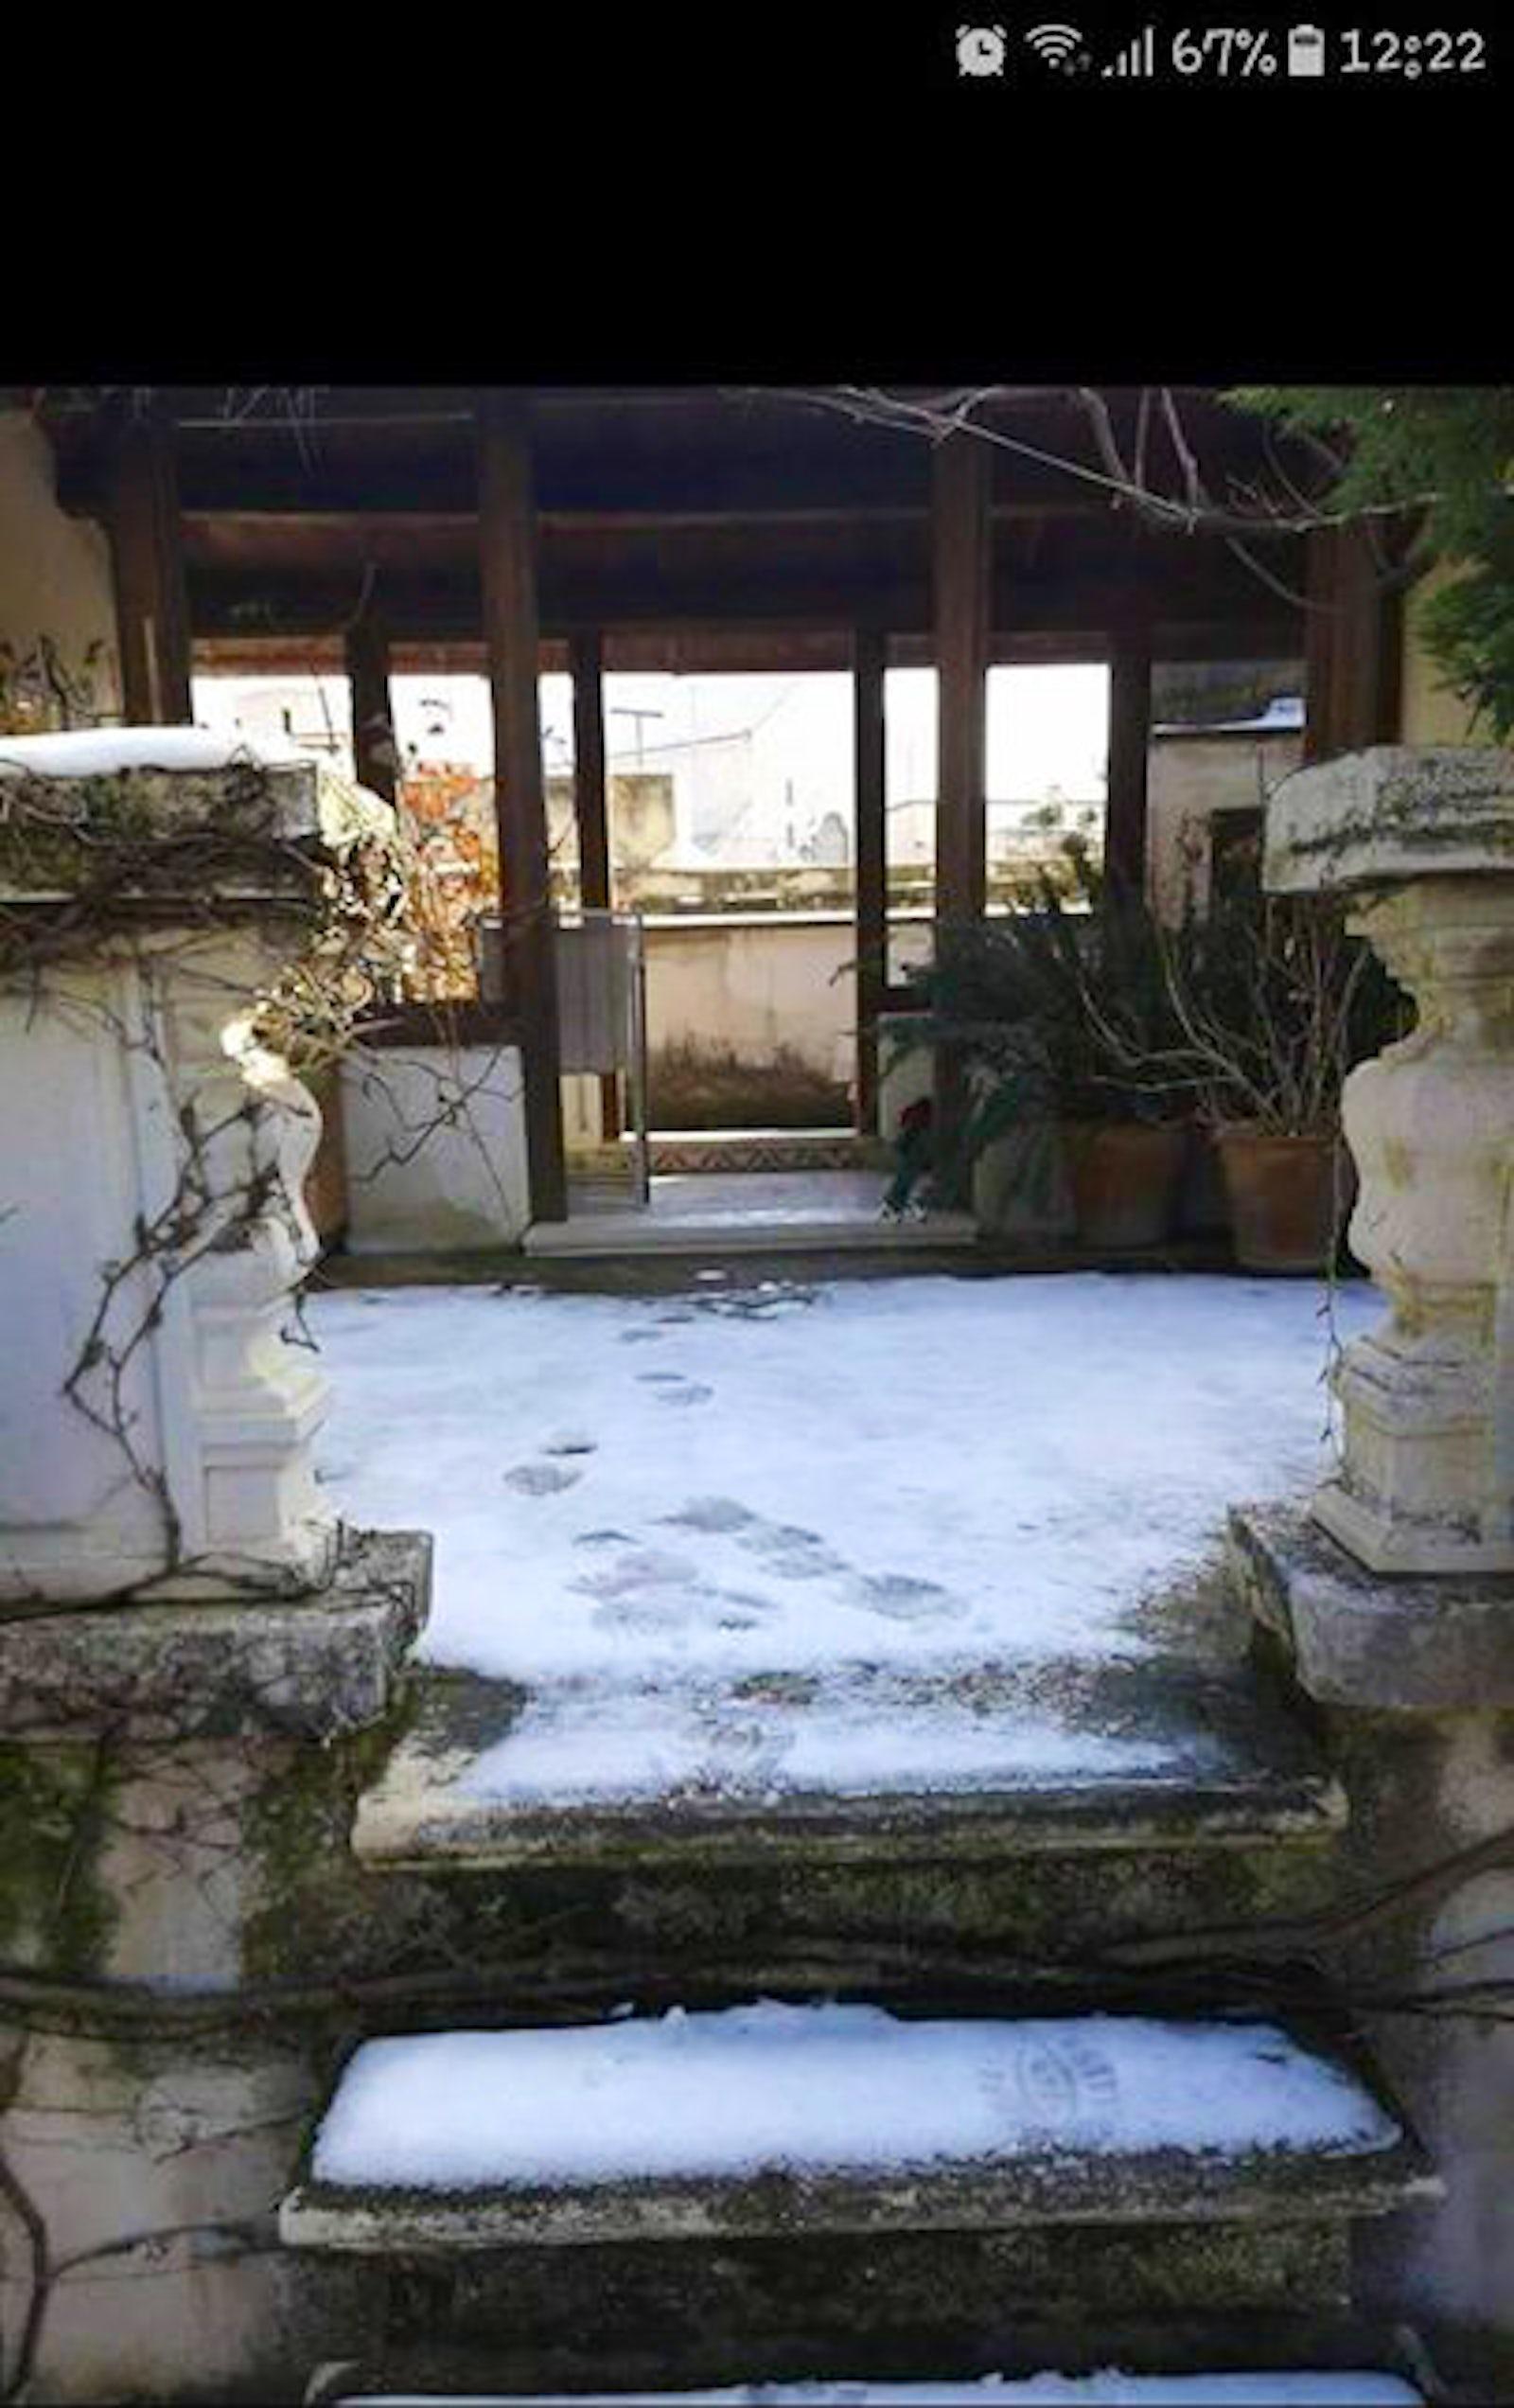 Bed & Breakfast Le Terrazze - Bisceglie - Puglia | itinari